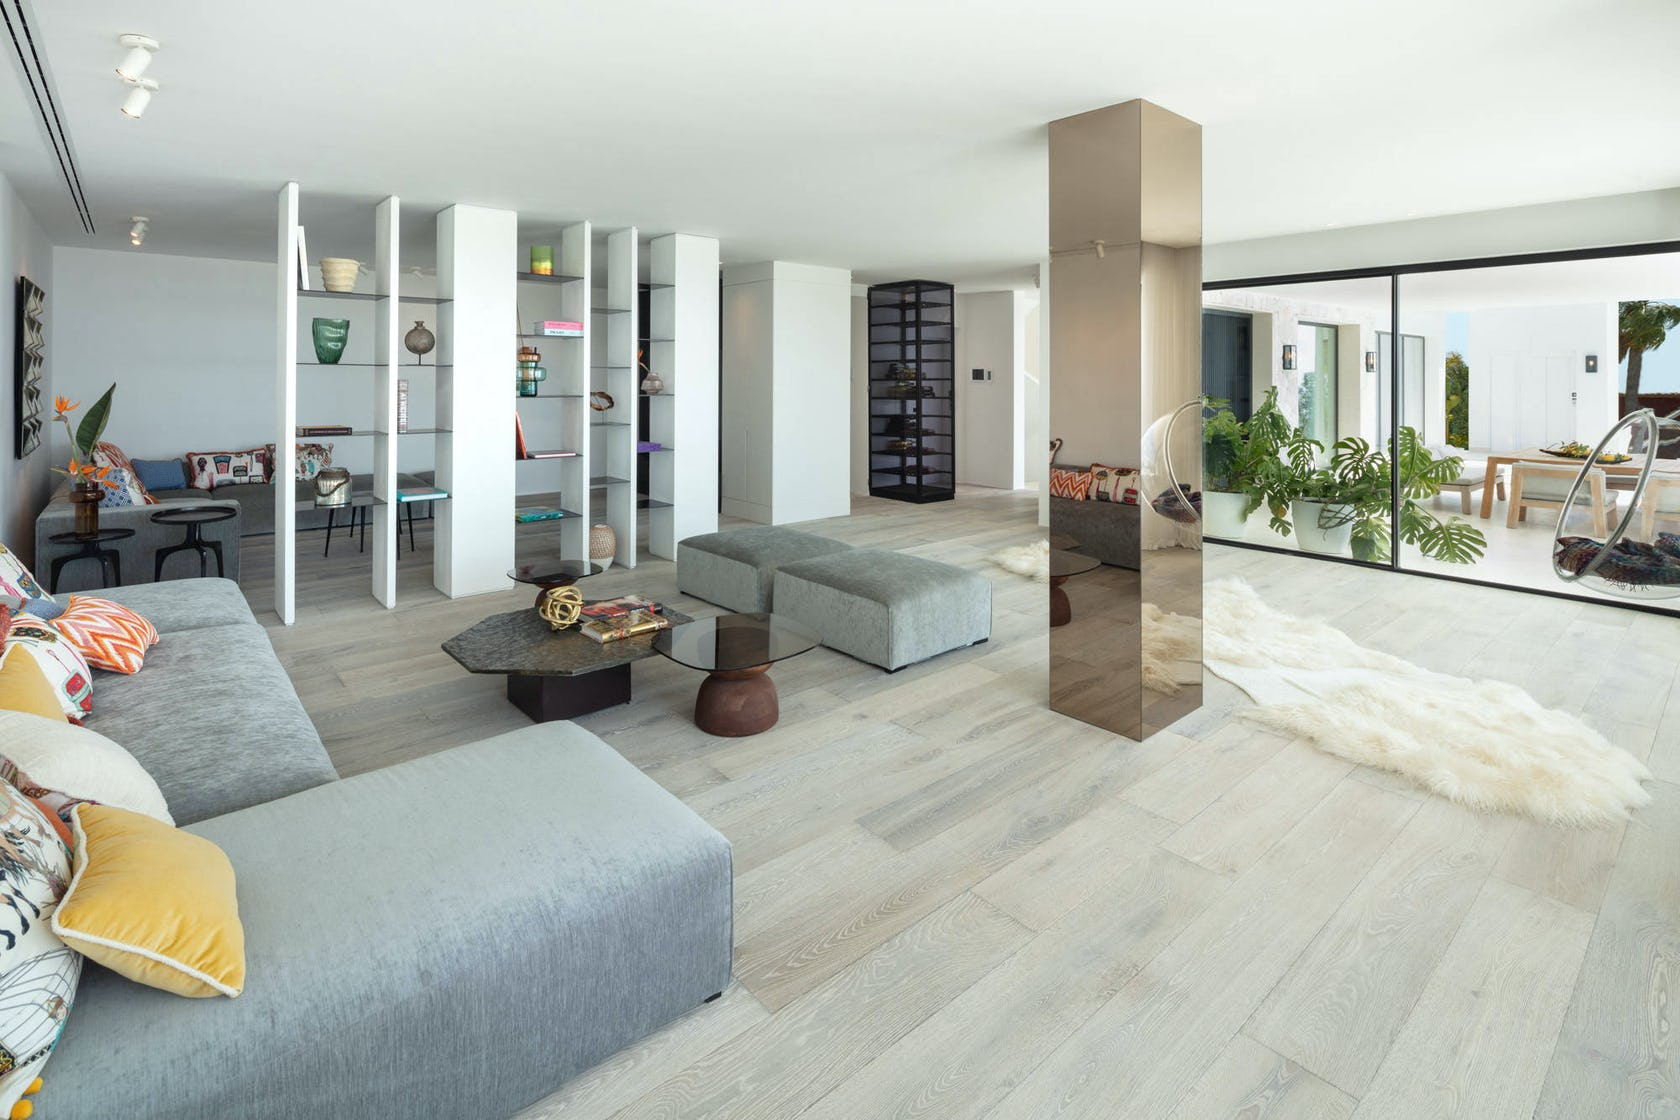 flooring floor furniture living room room indoors interior design table rug